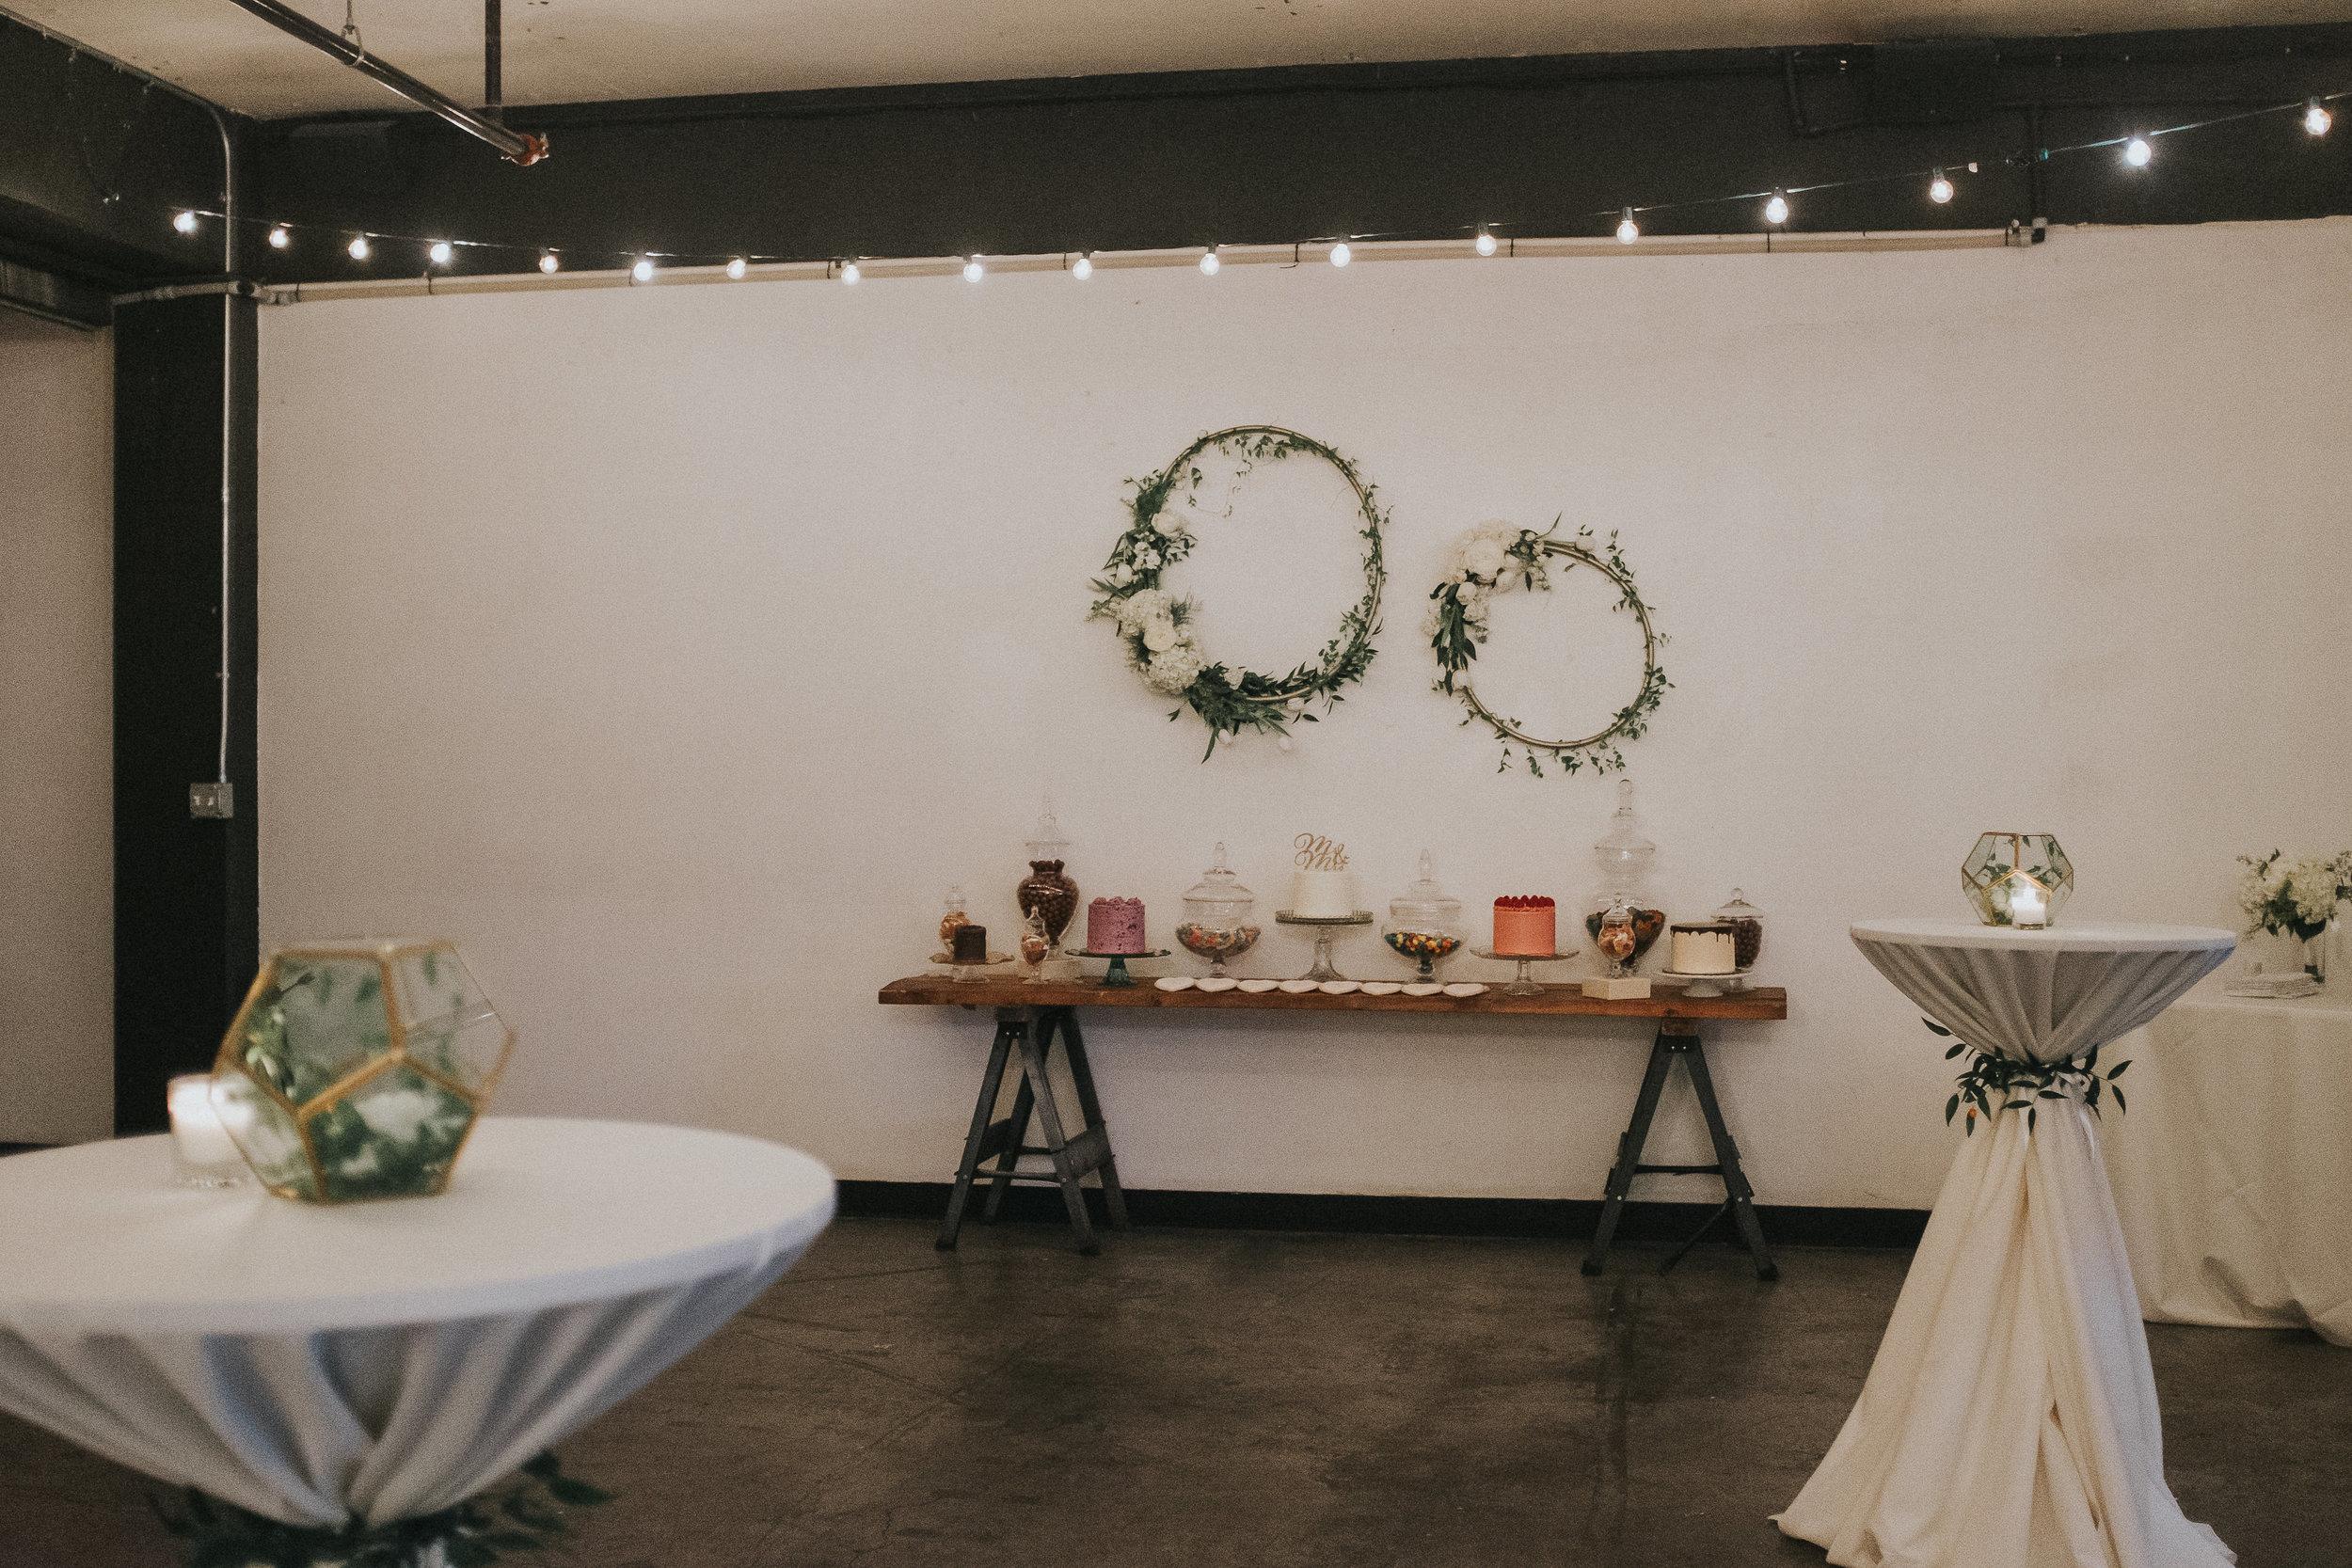 portland-wedding-venue-7.jpg